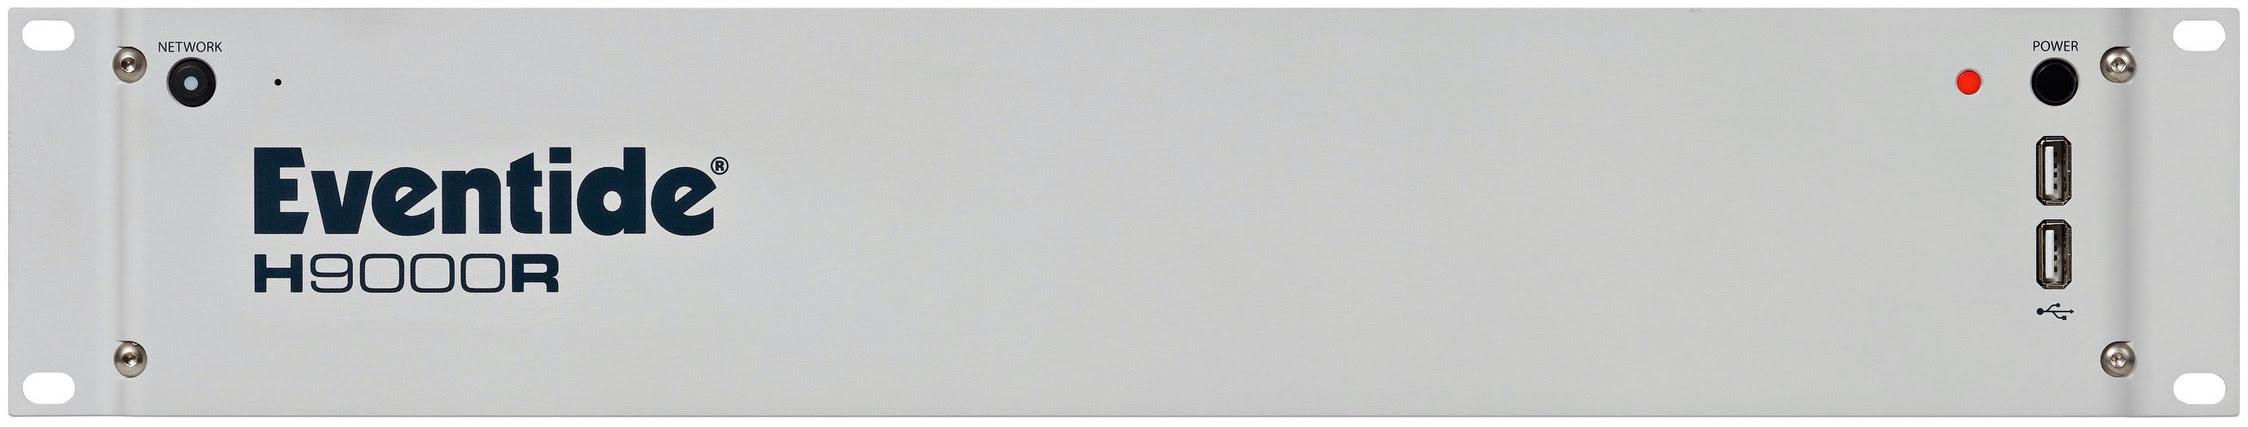 H9000R